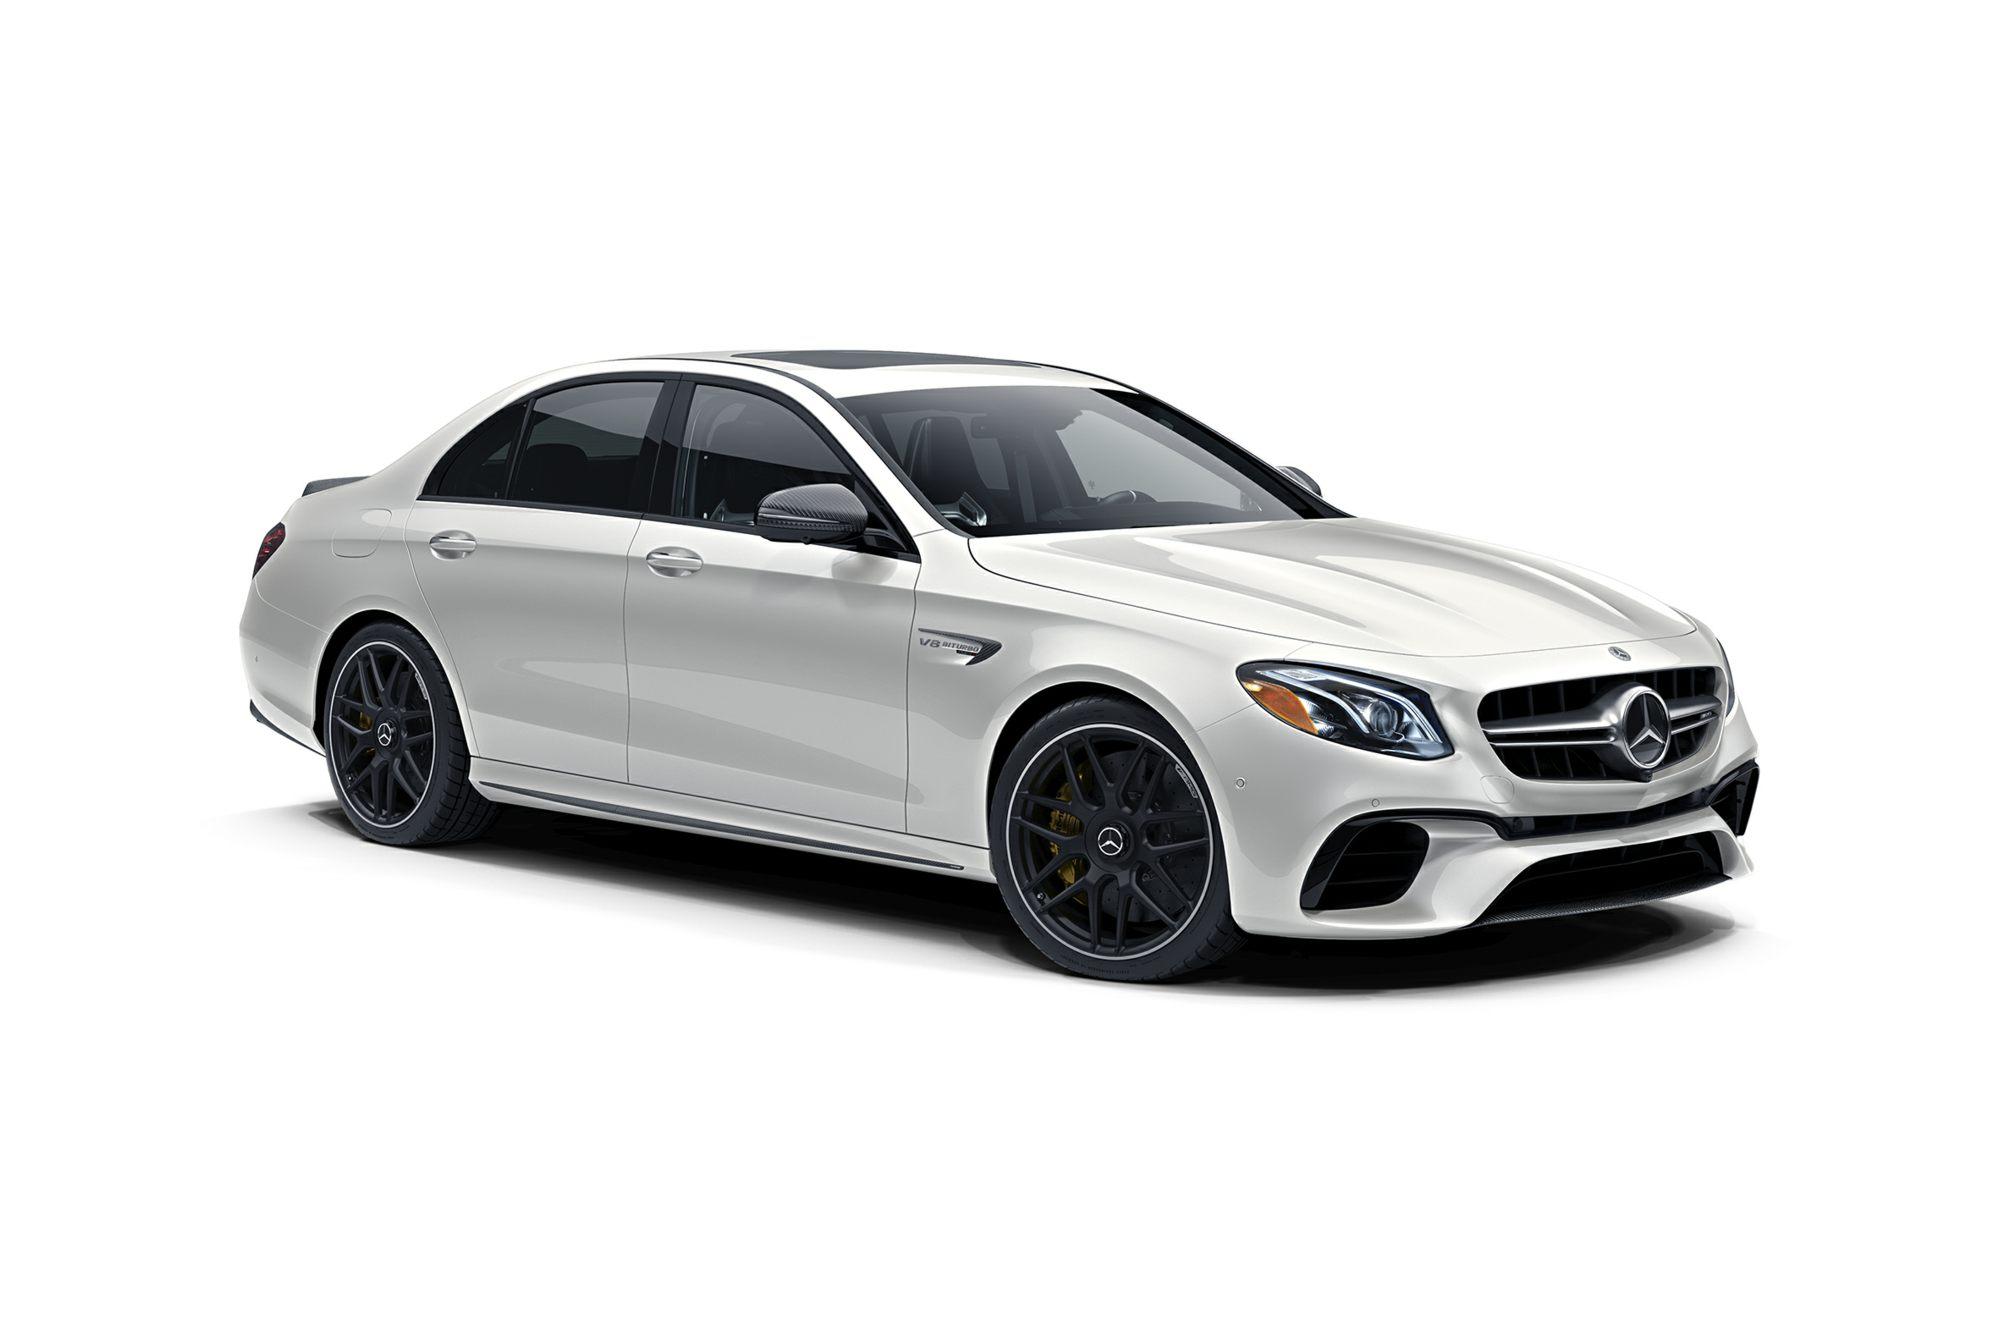 2020 Mercedes-Benz, Mercedes-AMG Cars and SUVs: Recall Alert